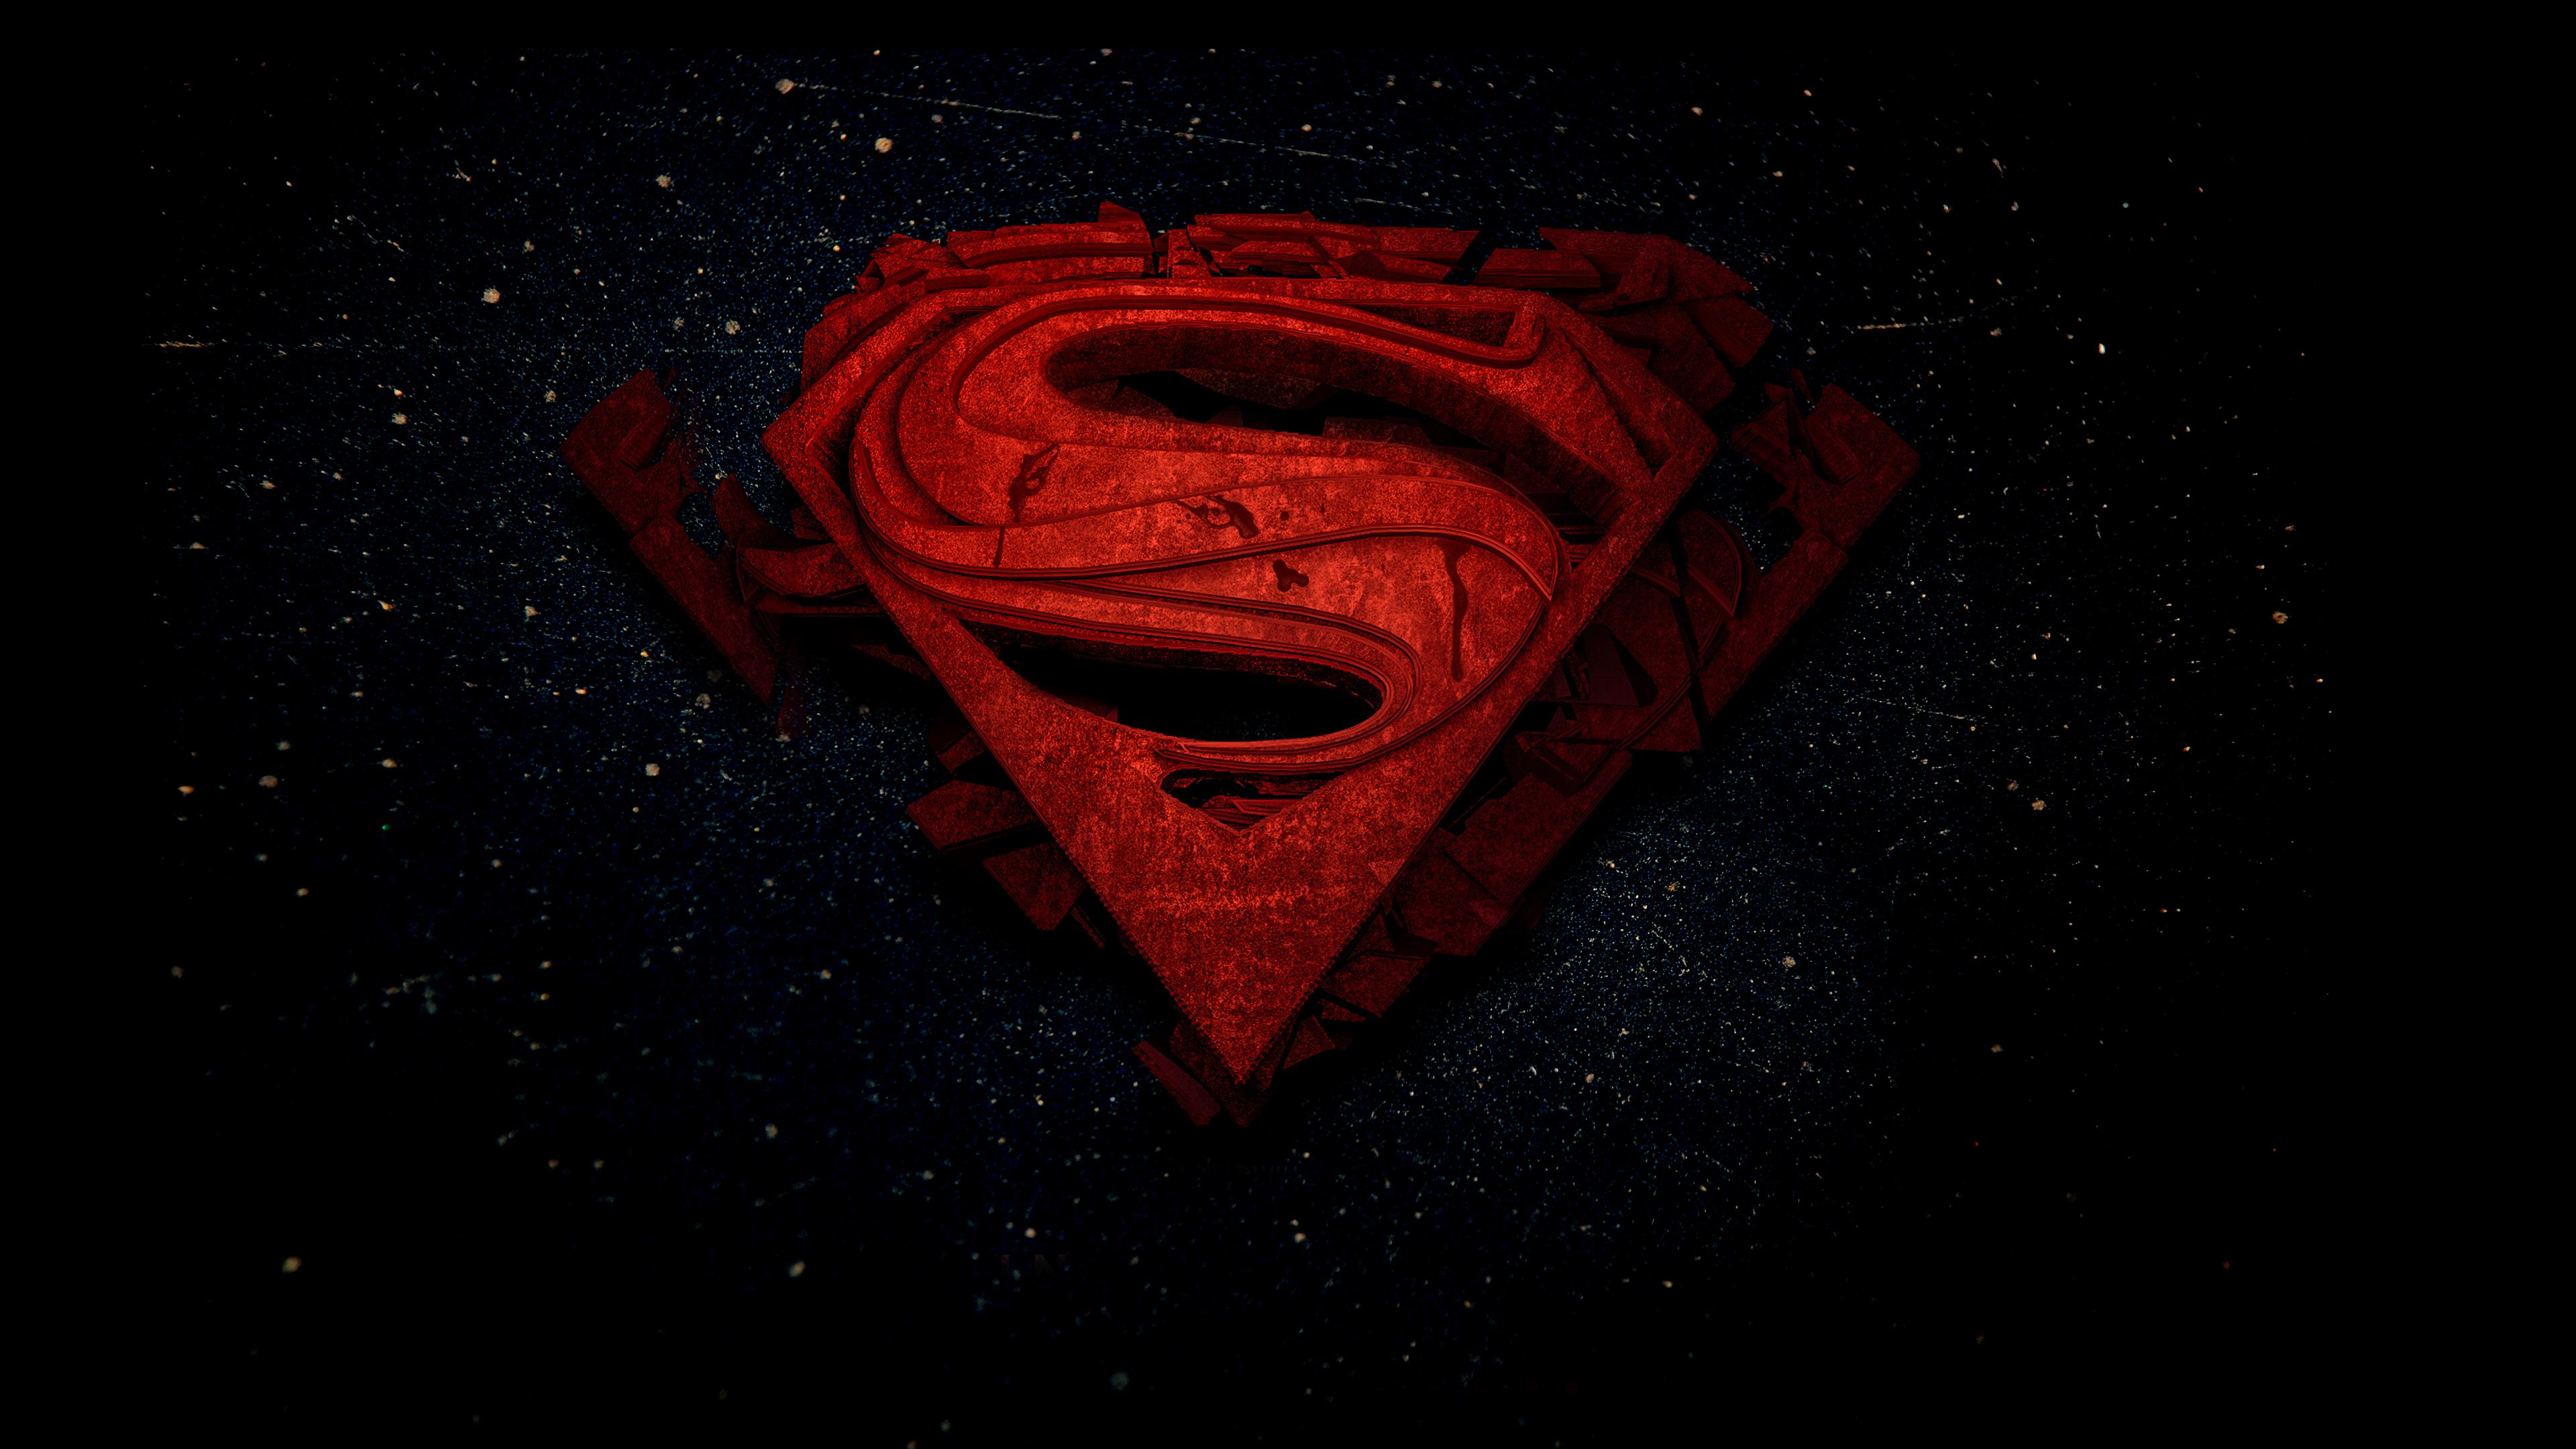 superman 3d logo 1565053253 - Superman 3d Logo - superman wallpapers, superheroes wallpapers, logo wallpapers, behance wallpapers, 4k-wallpapers, 3d wallpapers